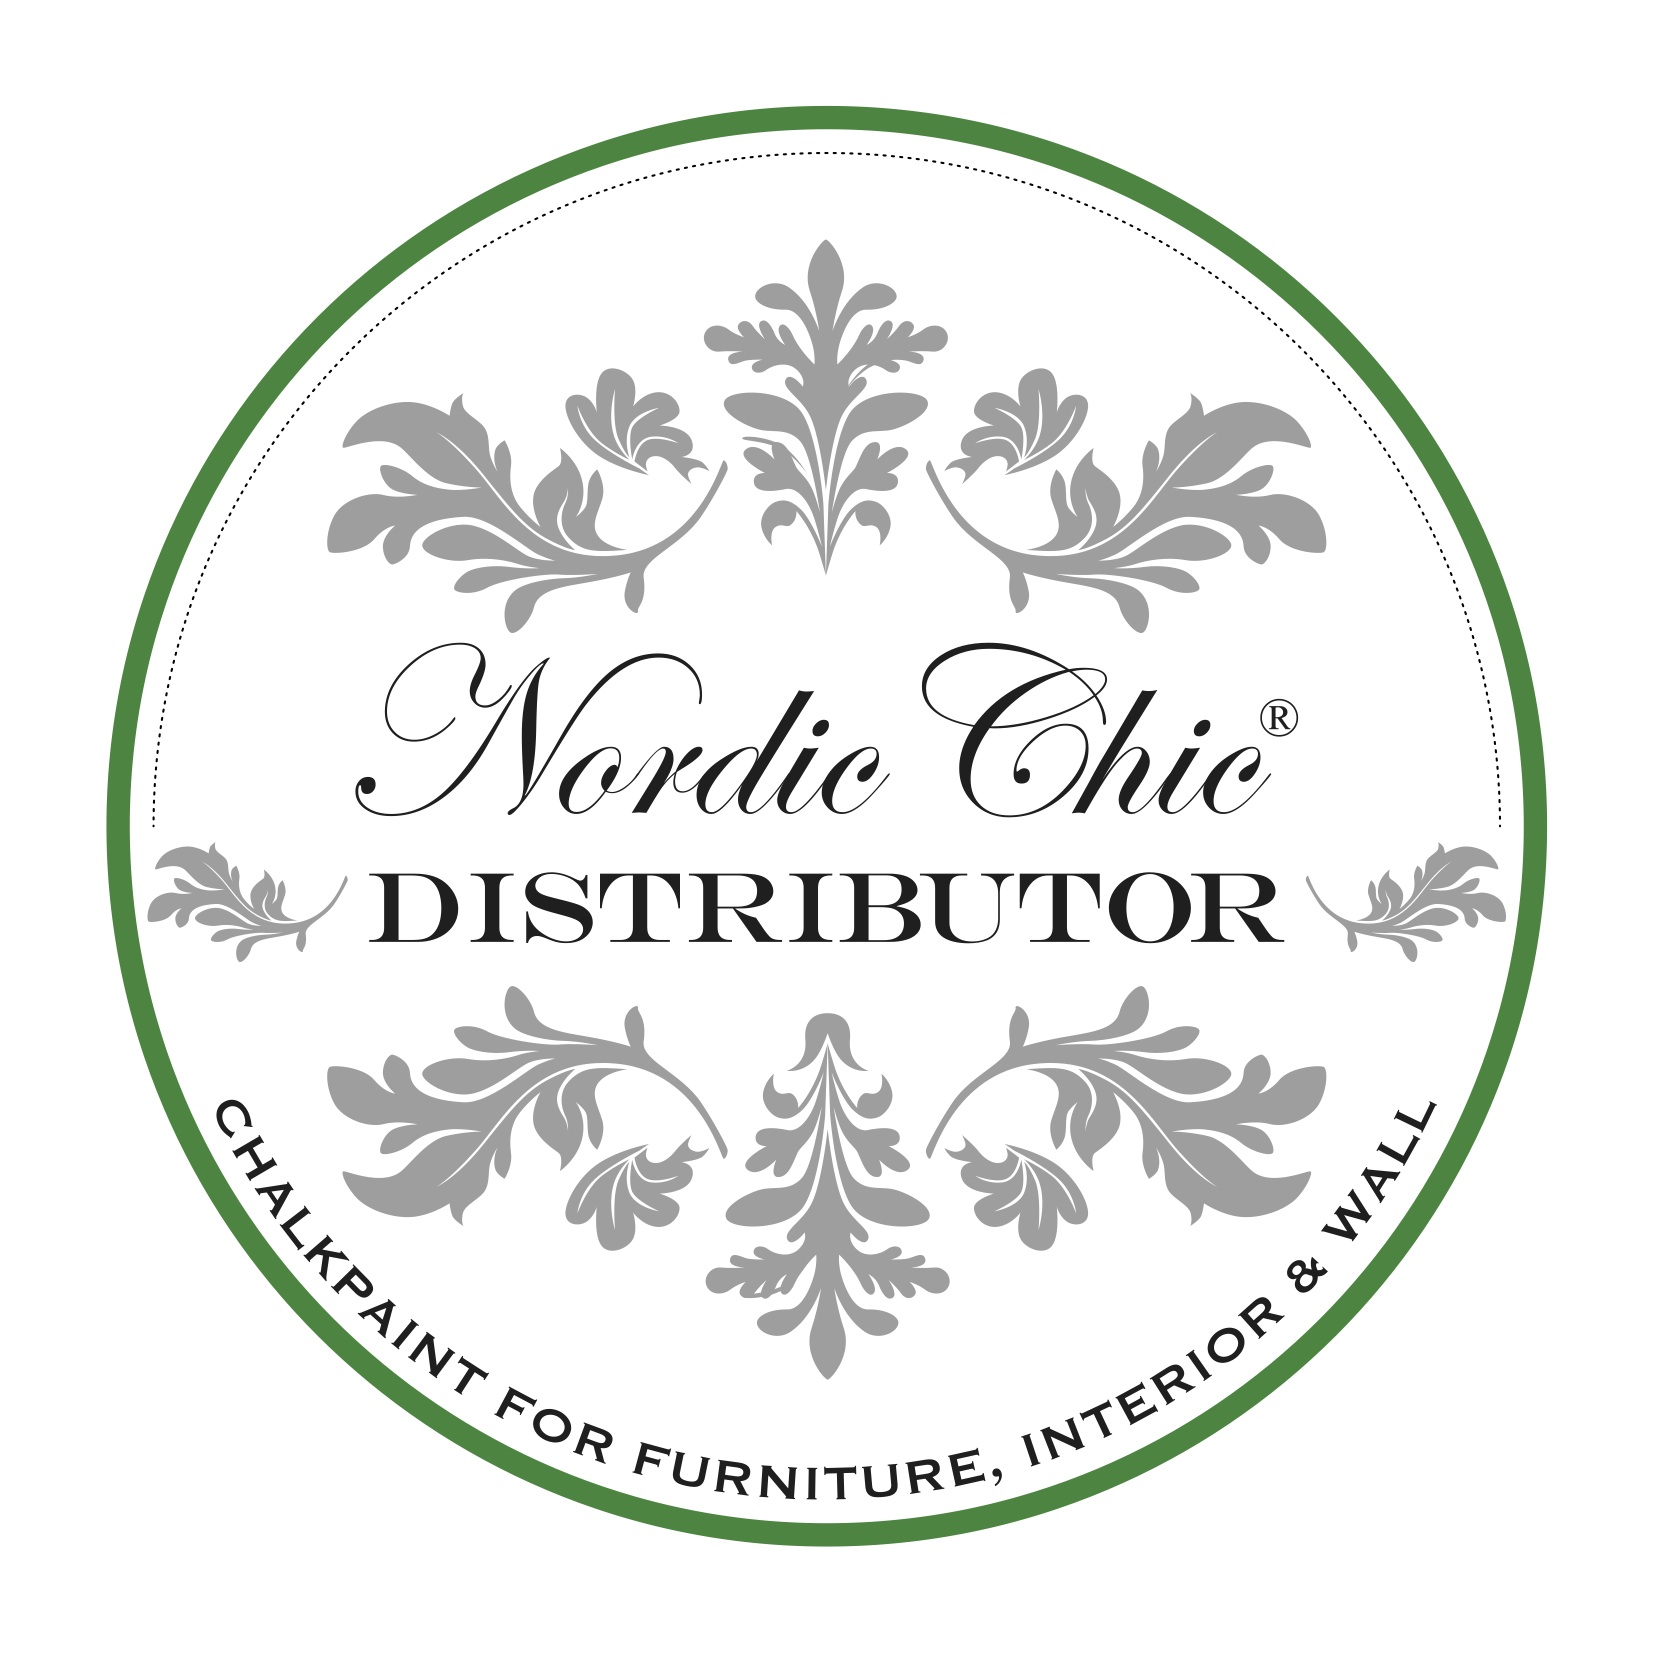 Nordic Chic Distributor-2019_grøn_UK.jpg